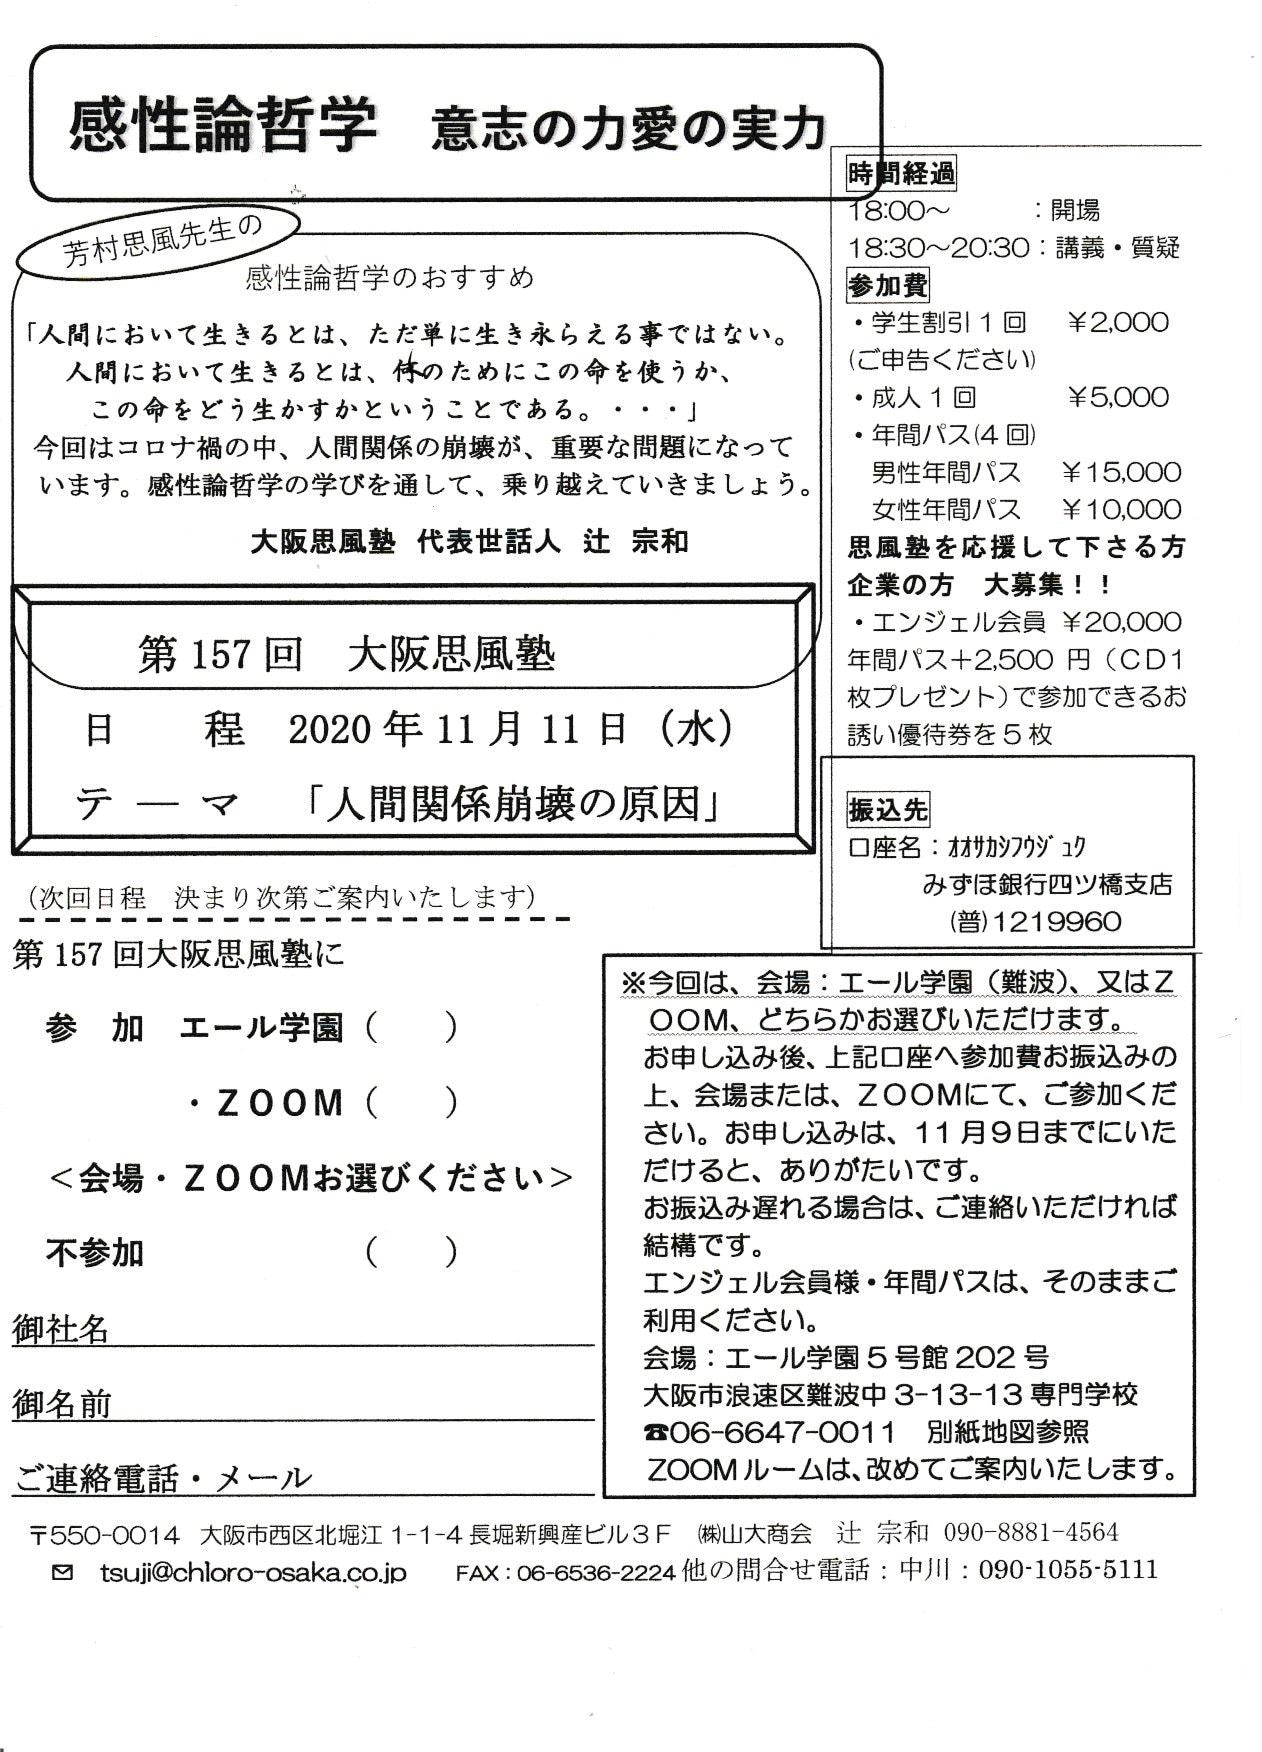 o1262175214837175436 1 - 11月11日(水)大阪思風塾のご案内